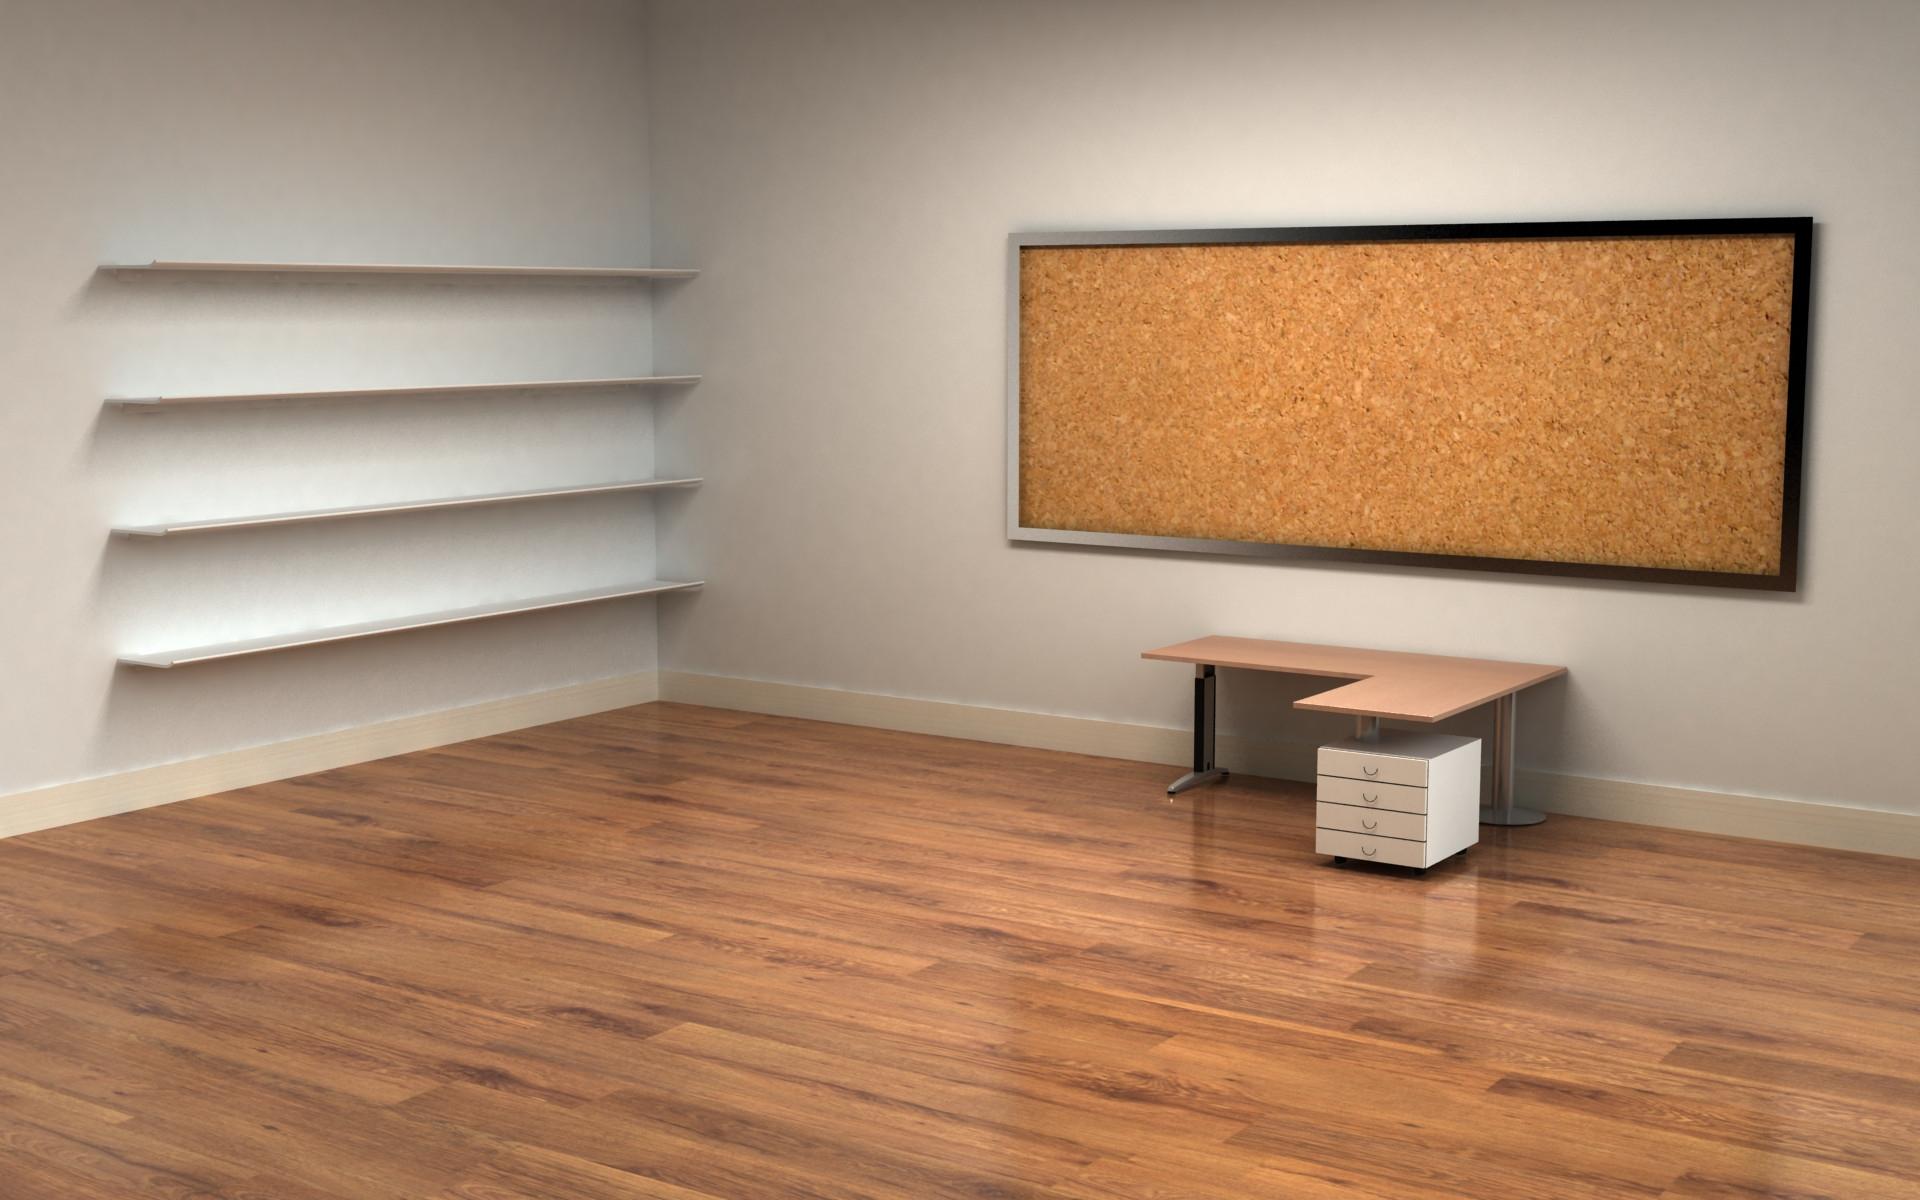 desktop organizer wallpaper | Your Brain Cubed